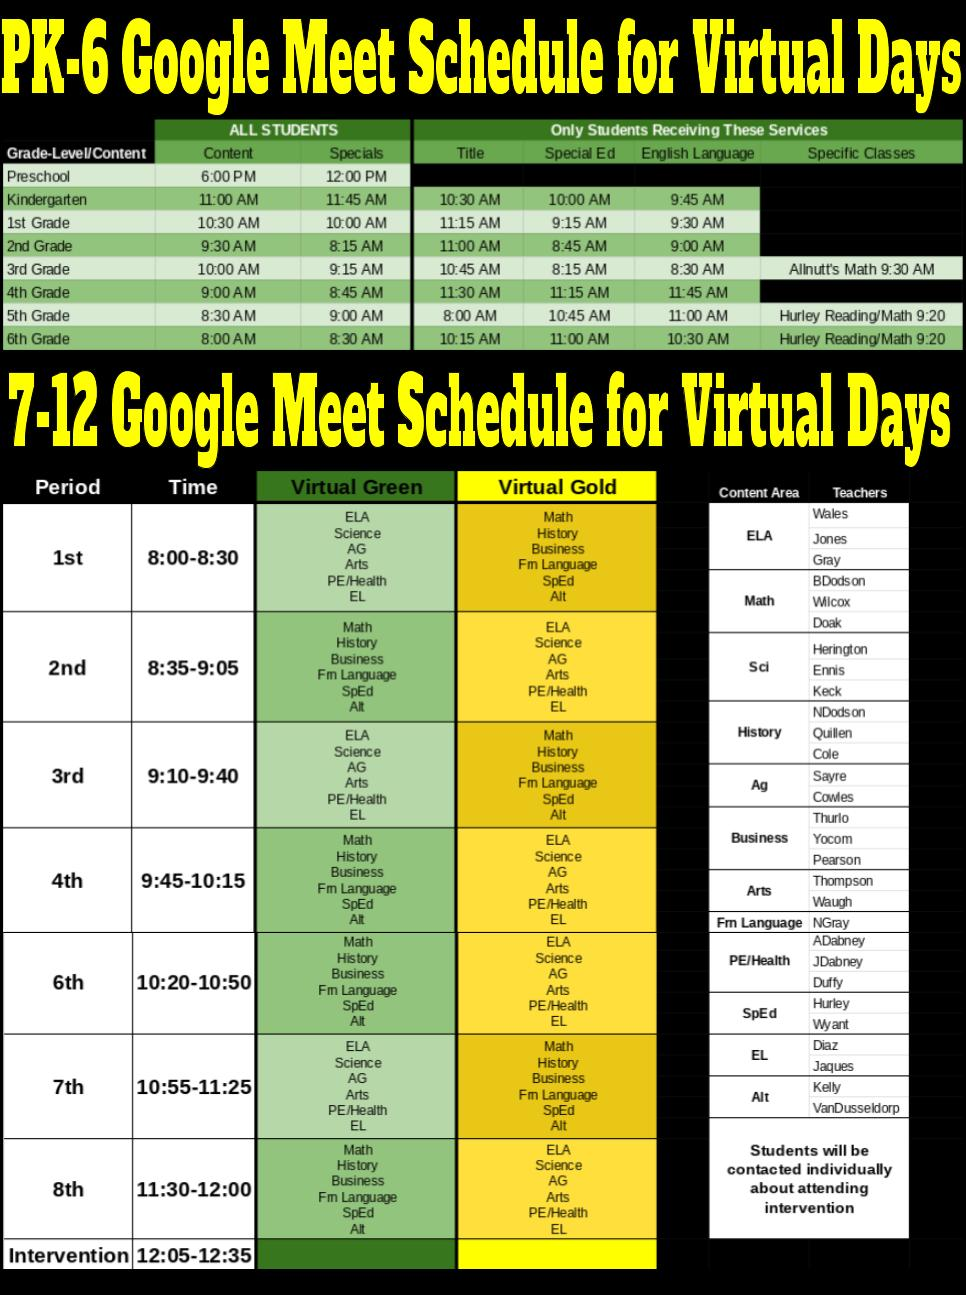 2020-21 PRESCHOOL-12TH GRADE GOOGLE MEET SCHEDULE FOR VIRTUAL DAYS